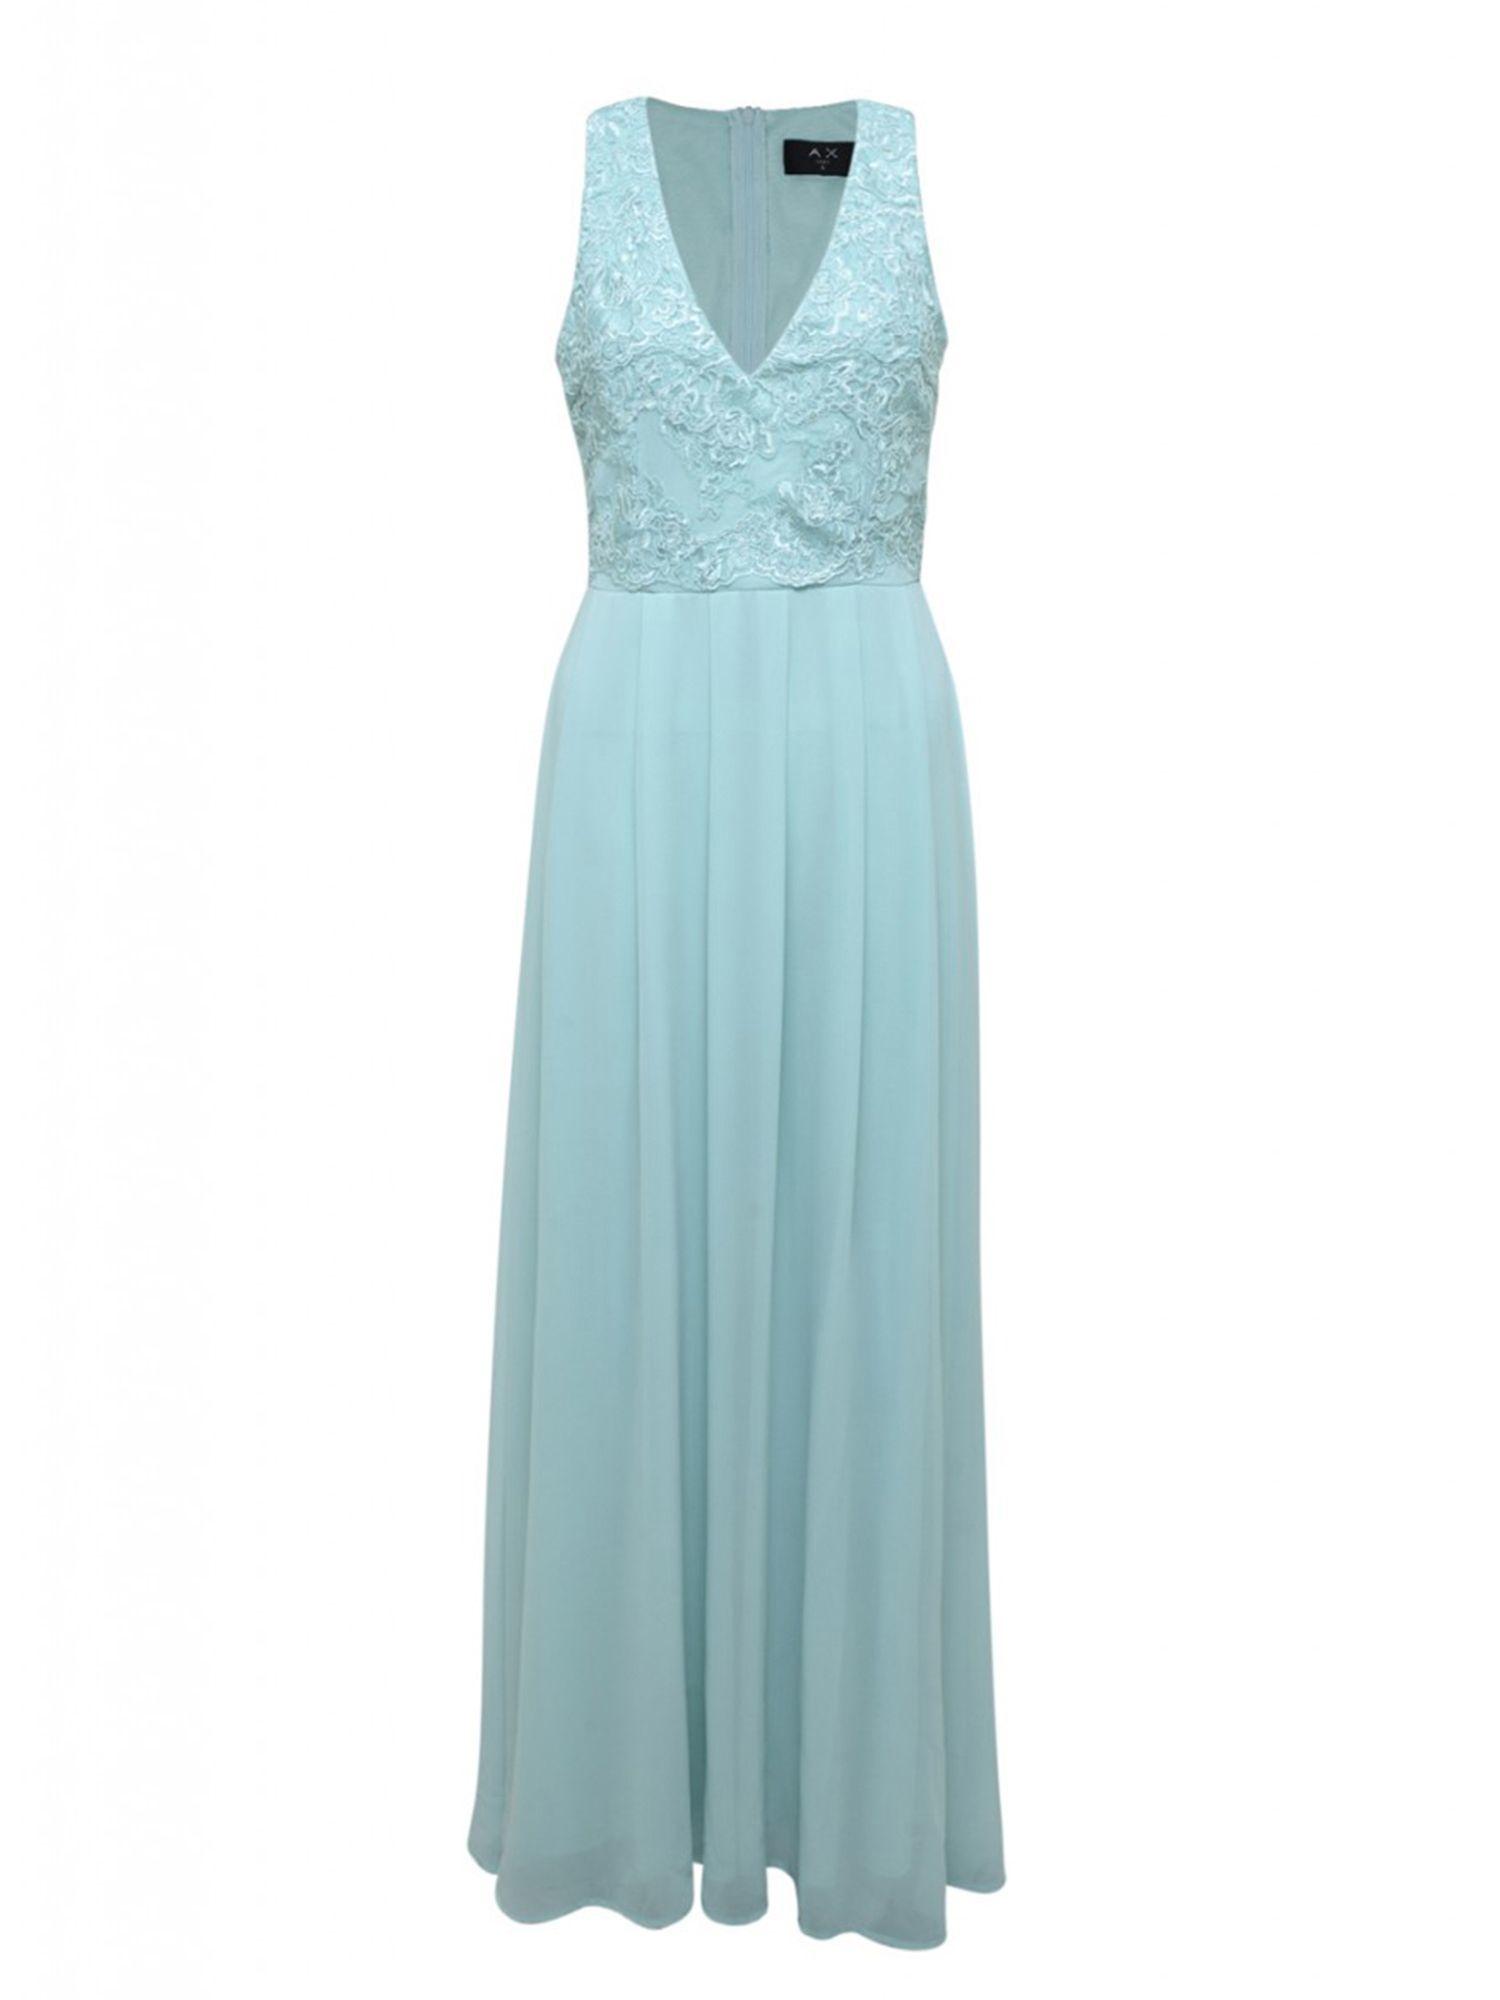 Ax paris Lace Top Maxi Dress in Blue   Lyst